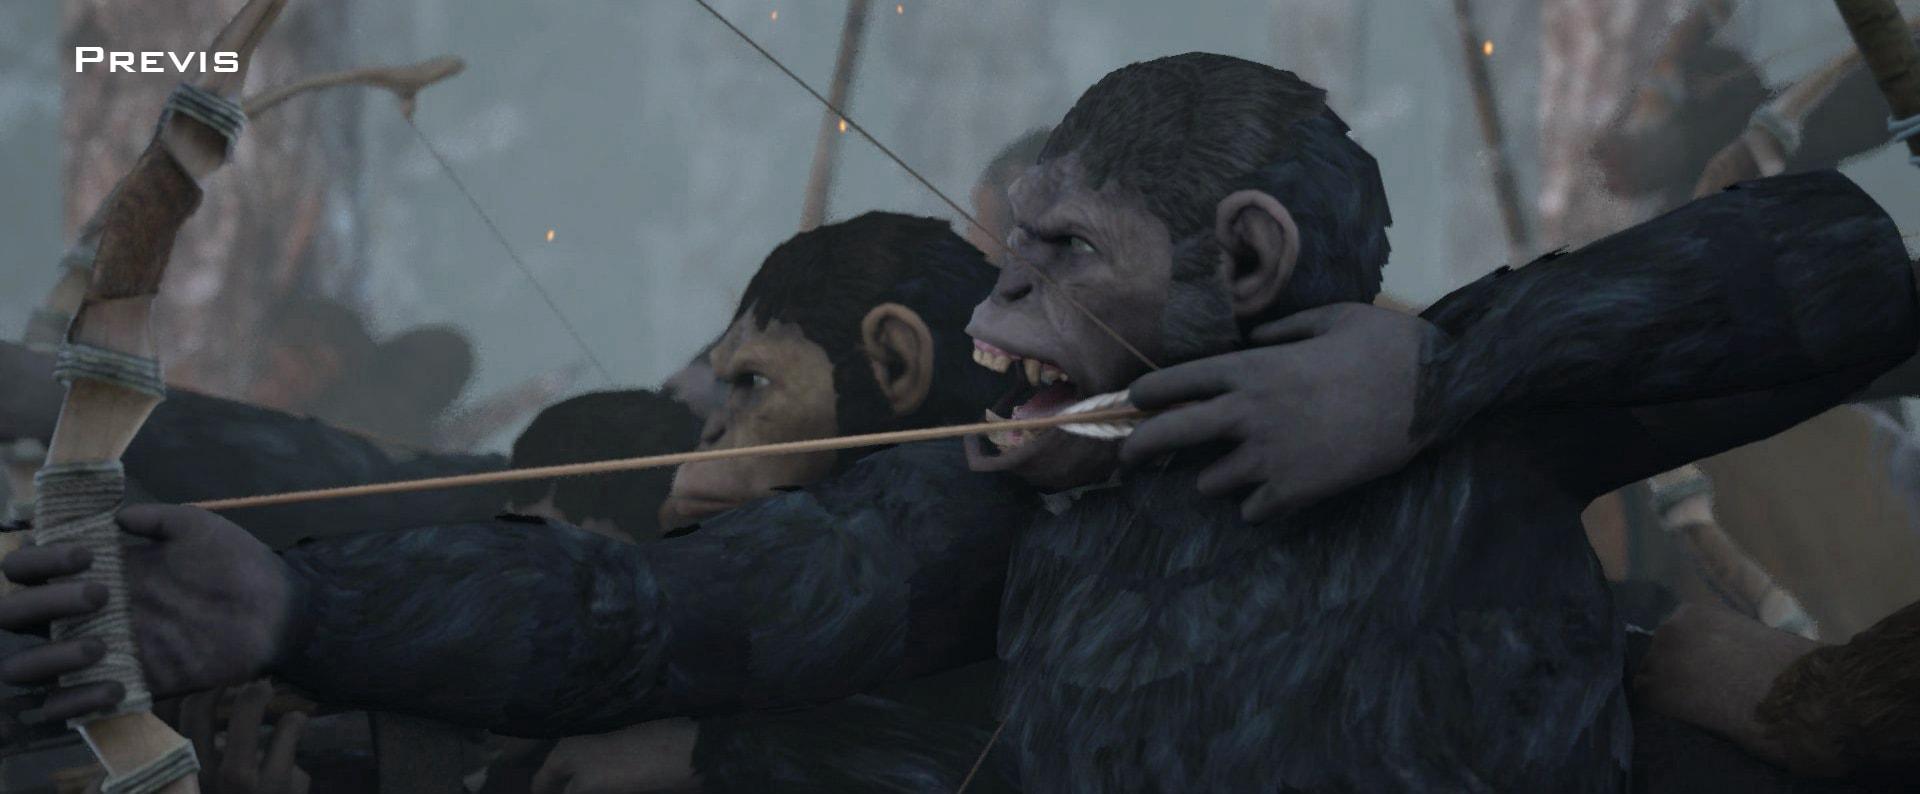 Apes3_Previs.009.jpg